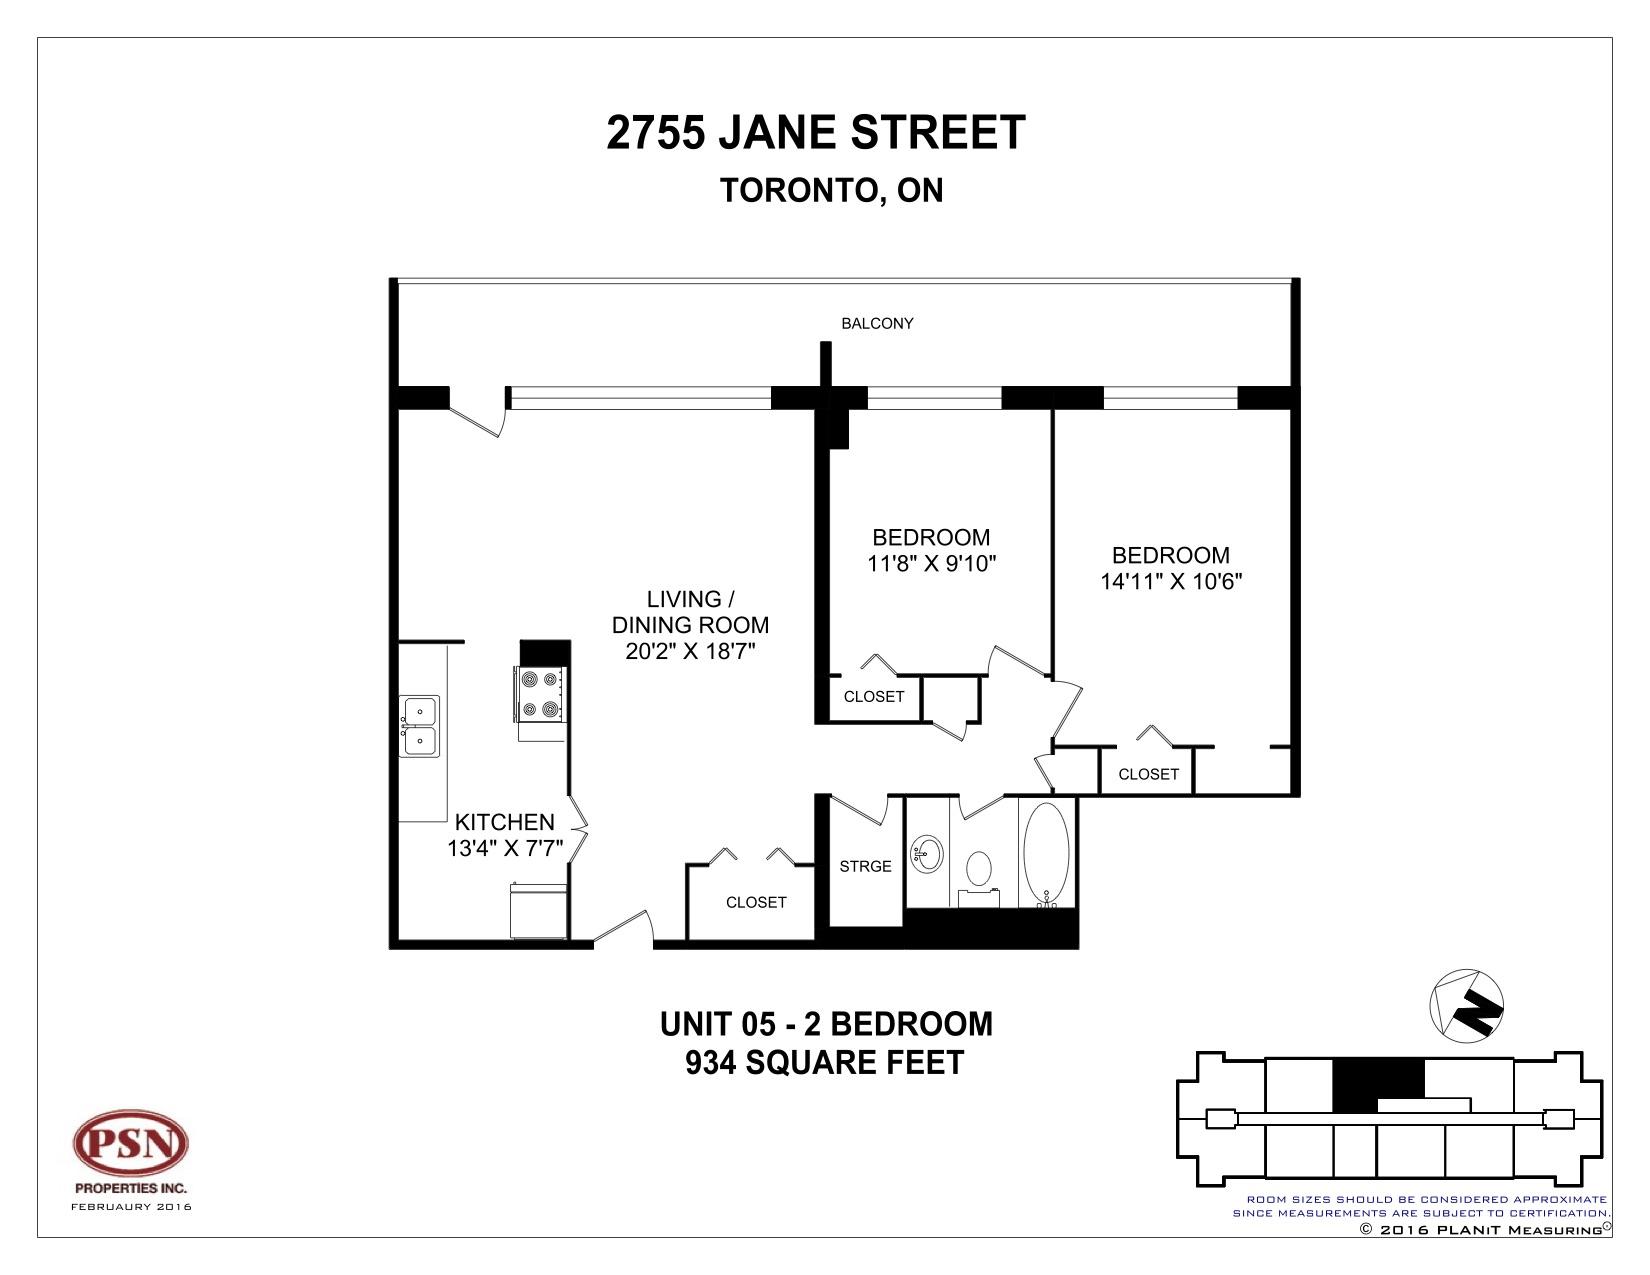 2755 Jane Street, Toronto for rent - RentSeeker ca